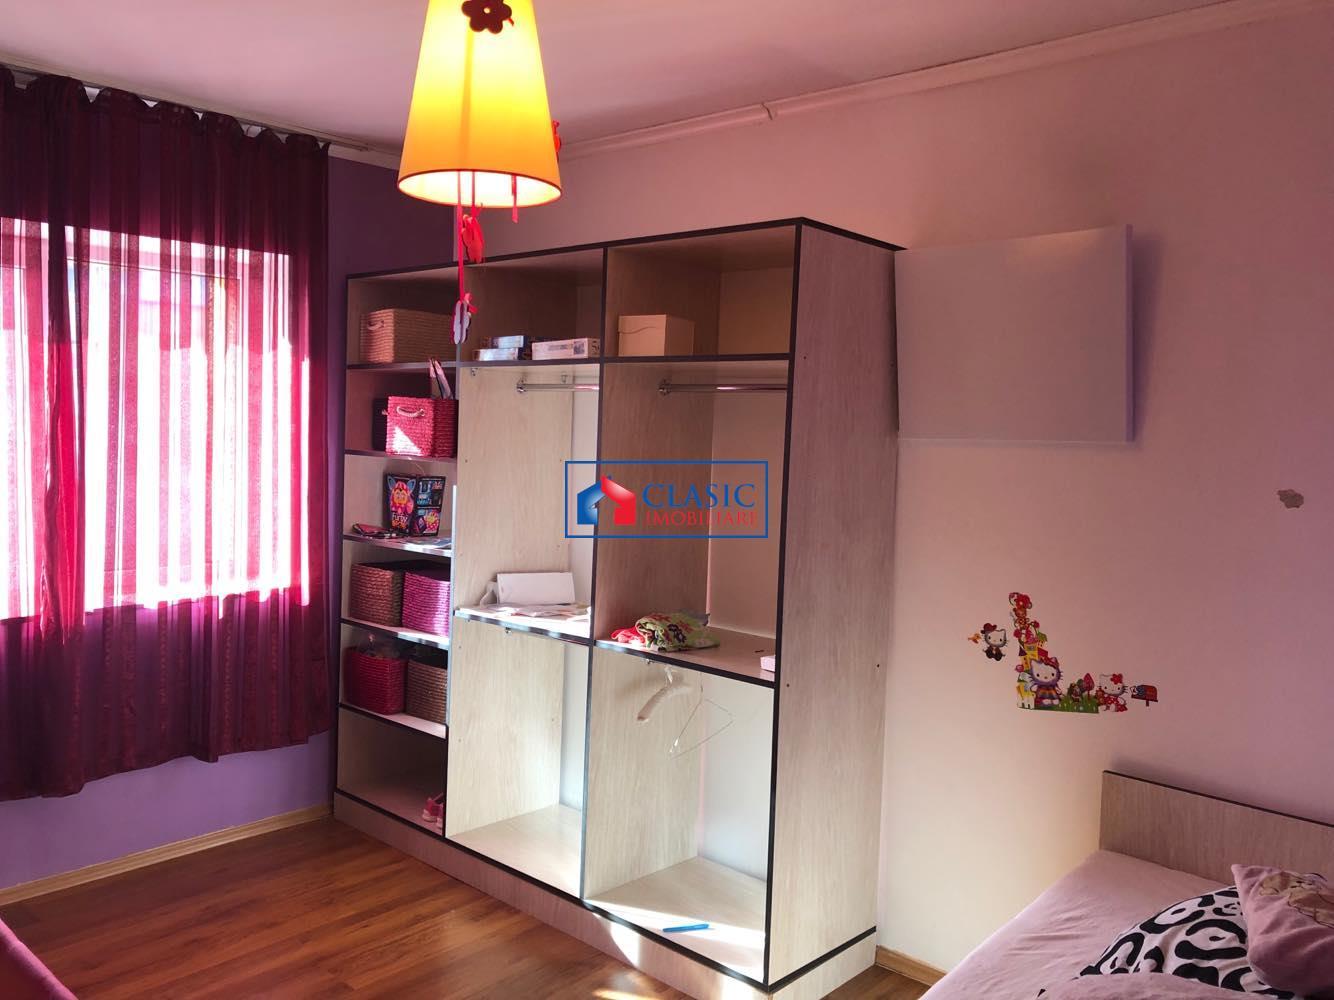 Inchiriere apartament 4 camere modern in Zorilor  Profi Observatorului